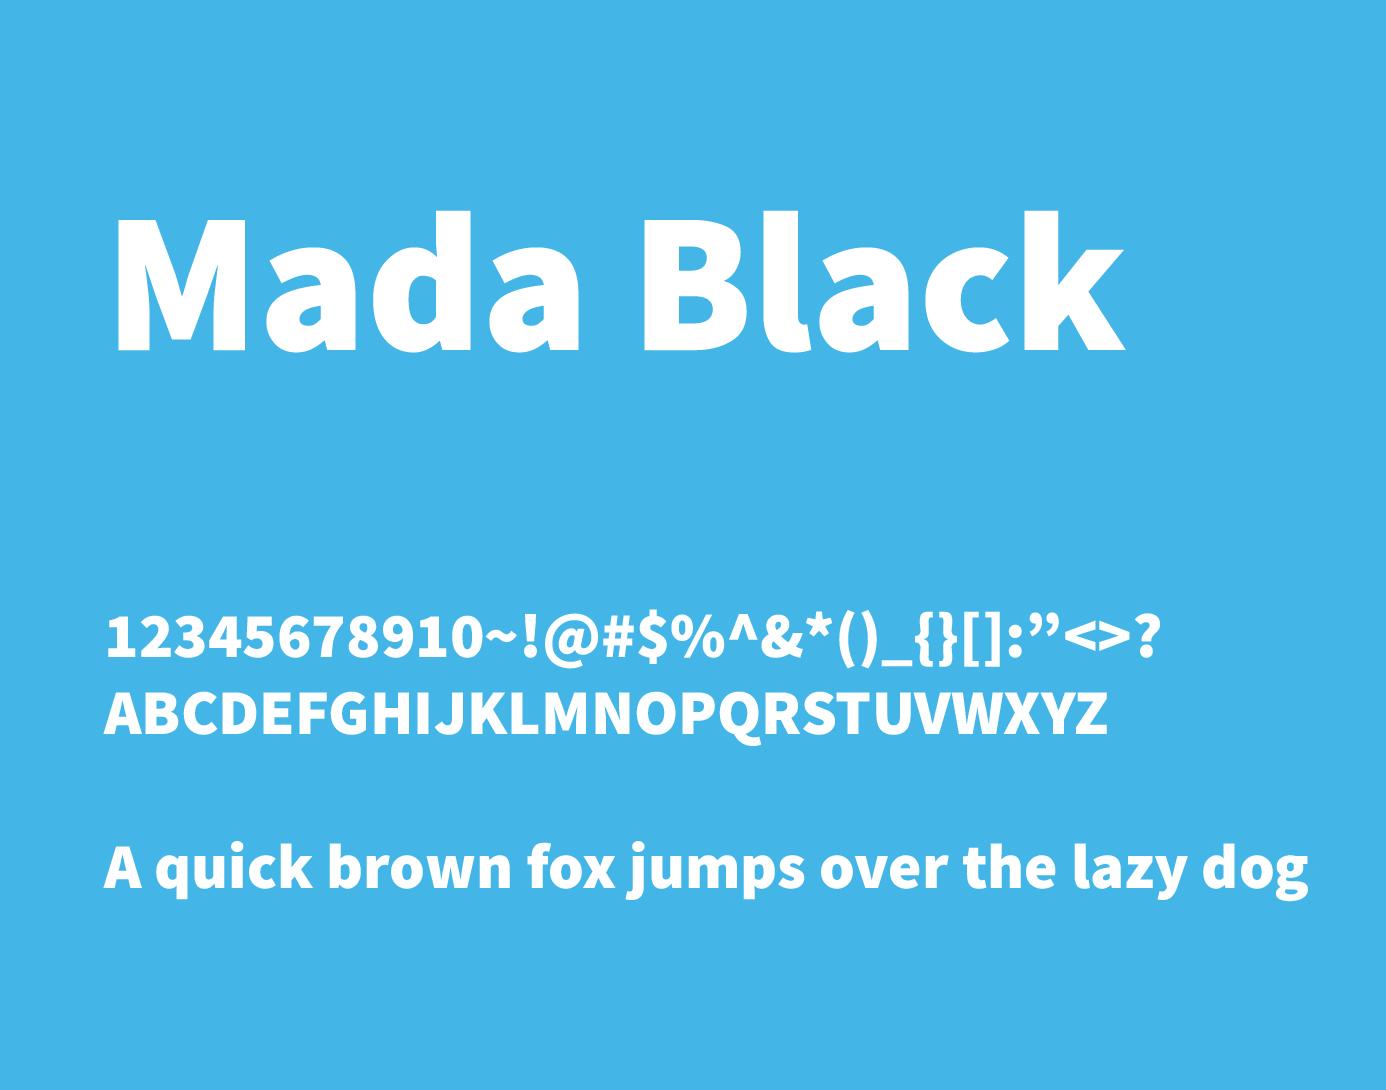 mada black